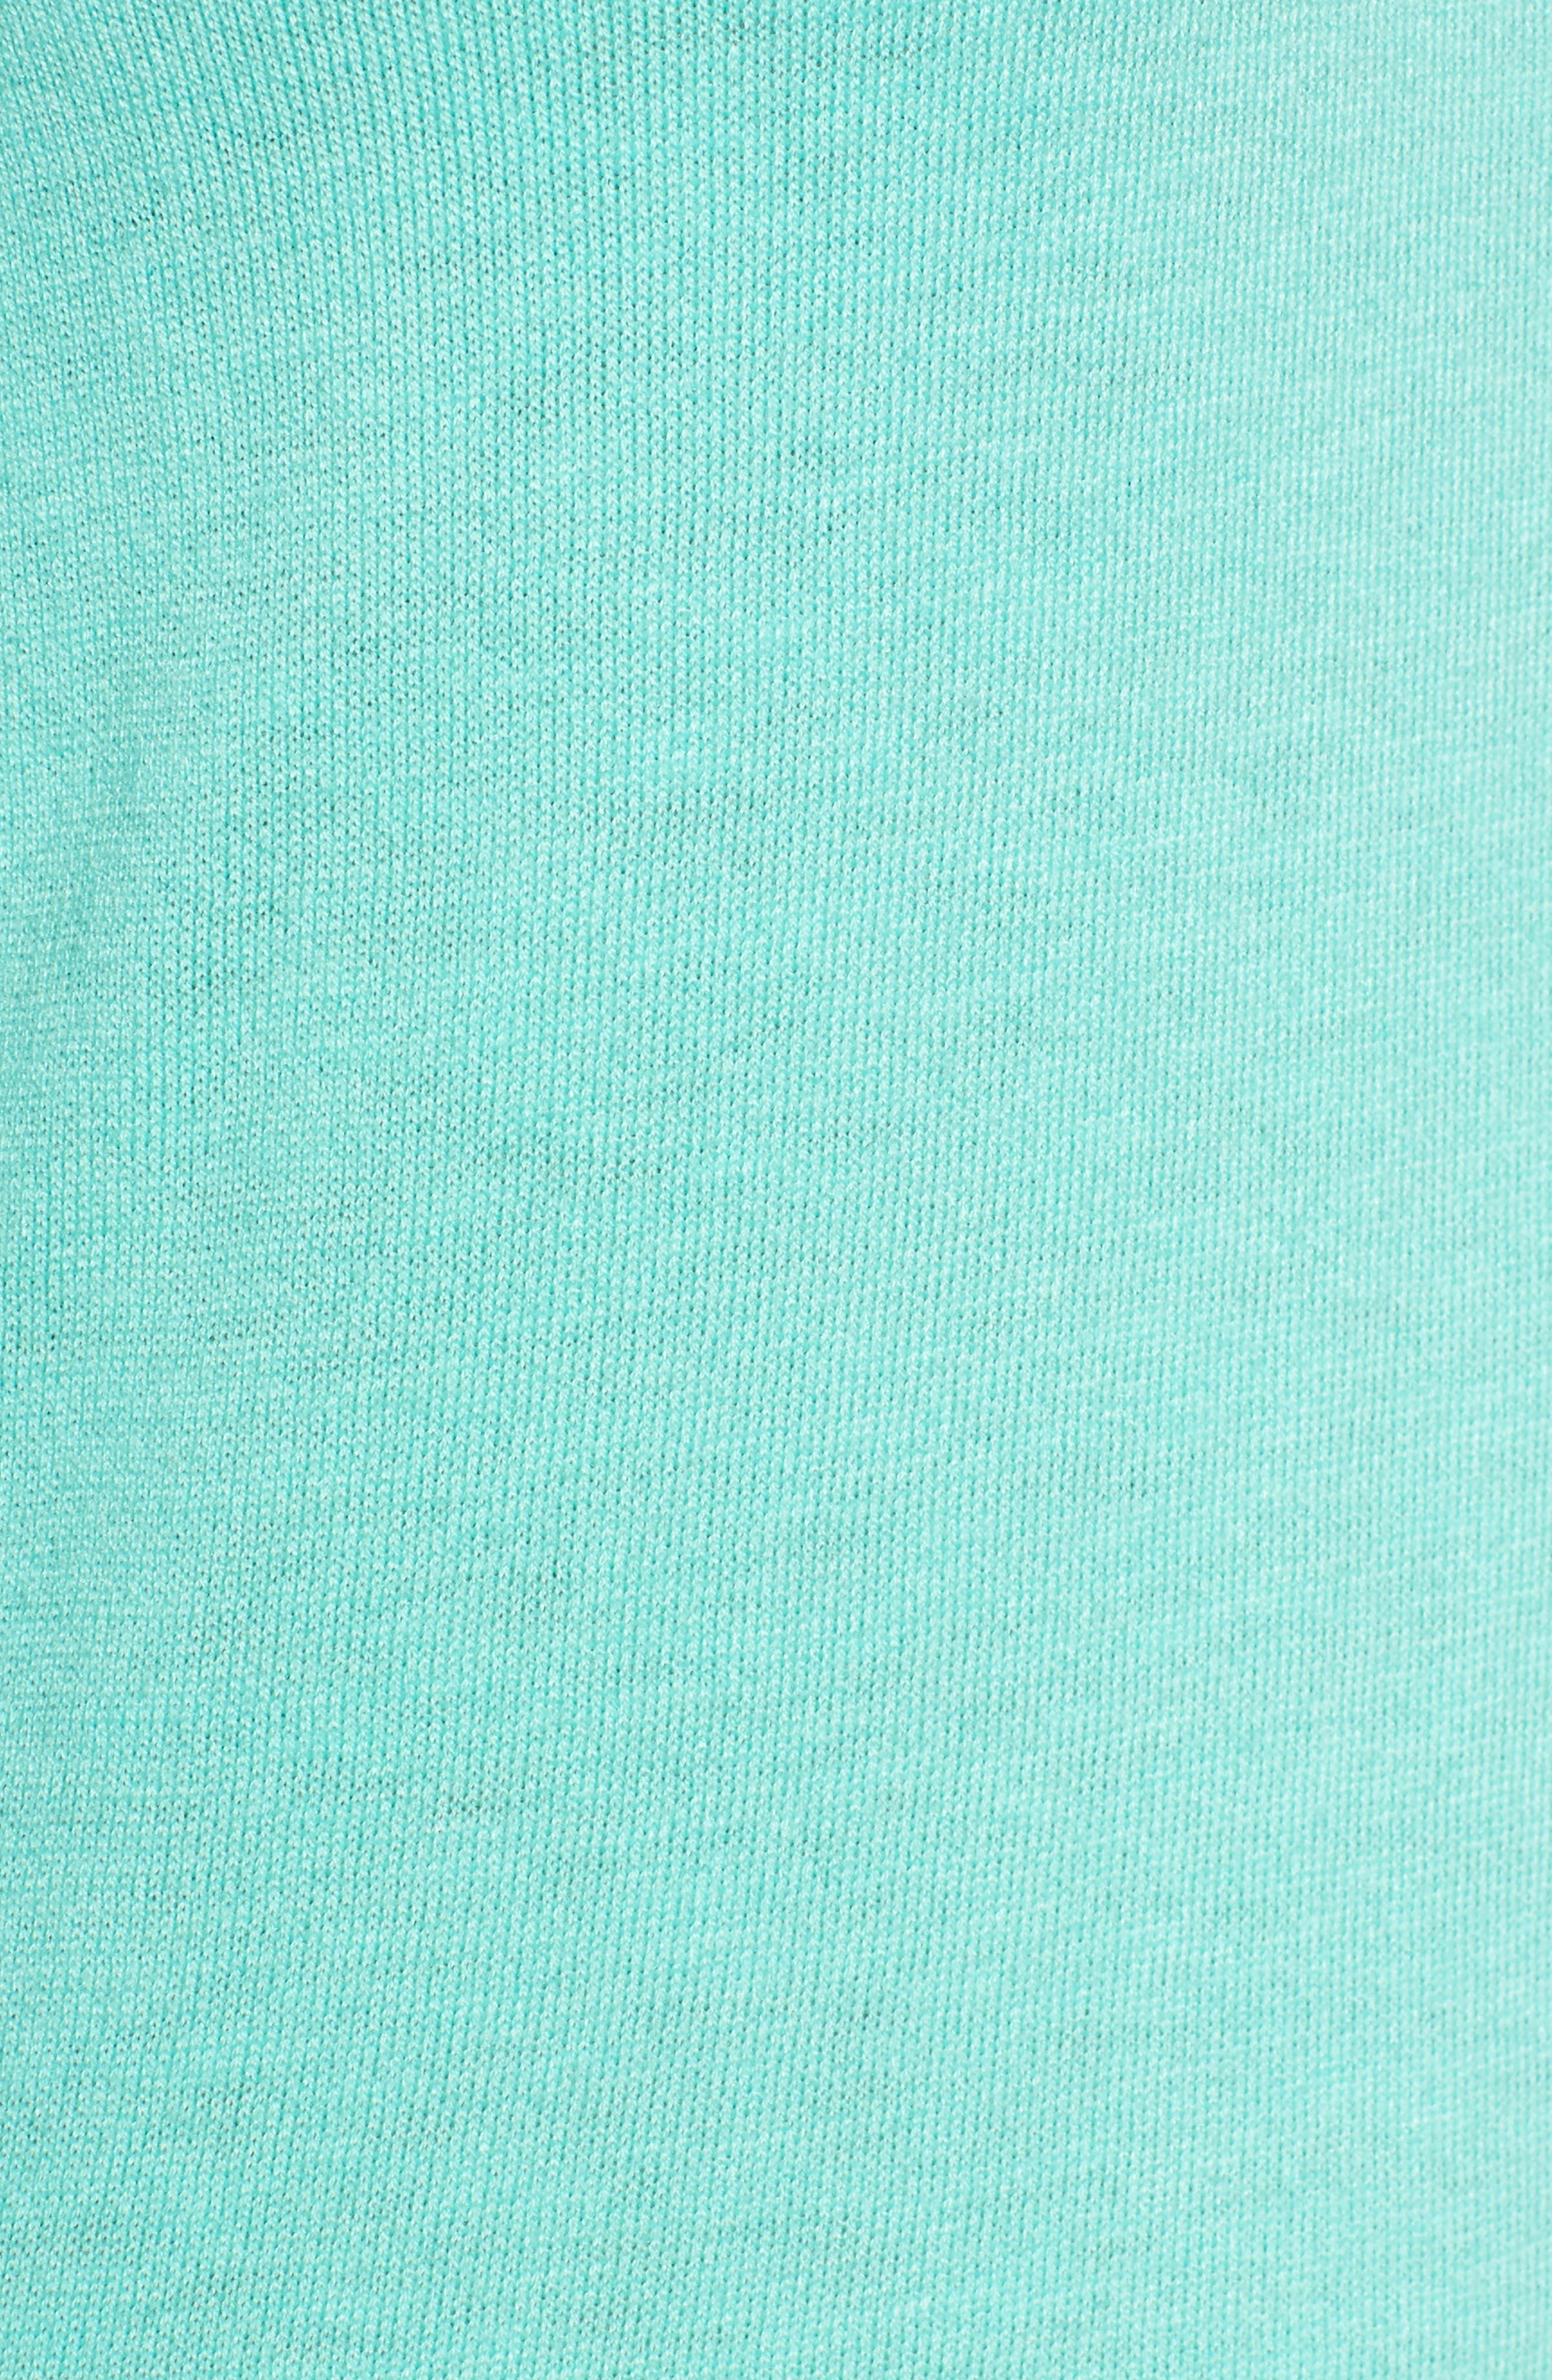 Tie Sleeve Crewneck Sweater,                             Alternate thumbnail 5, color,                             312